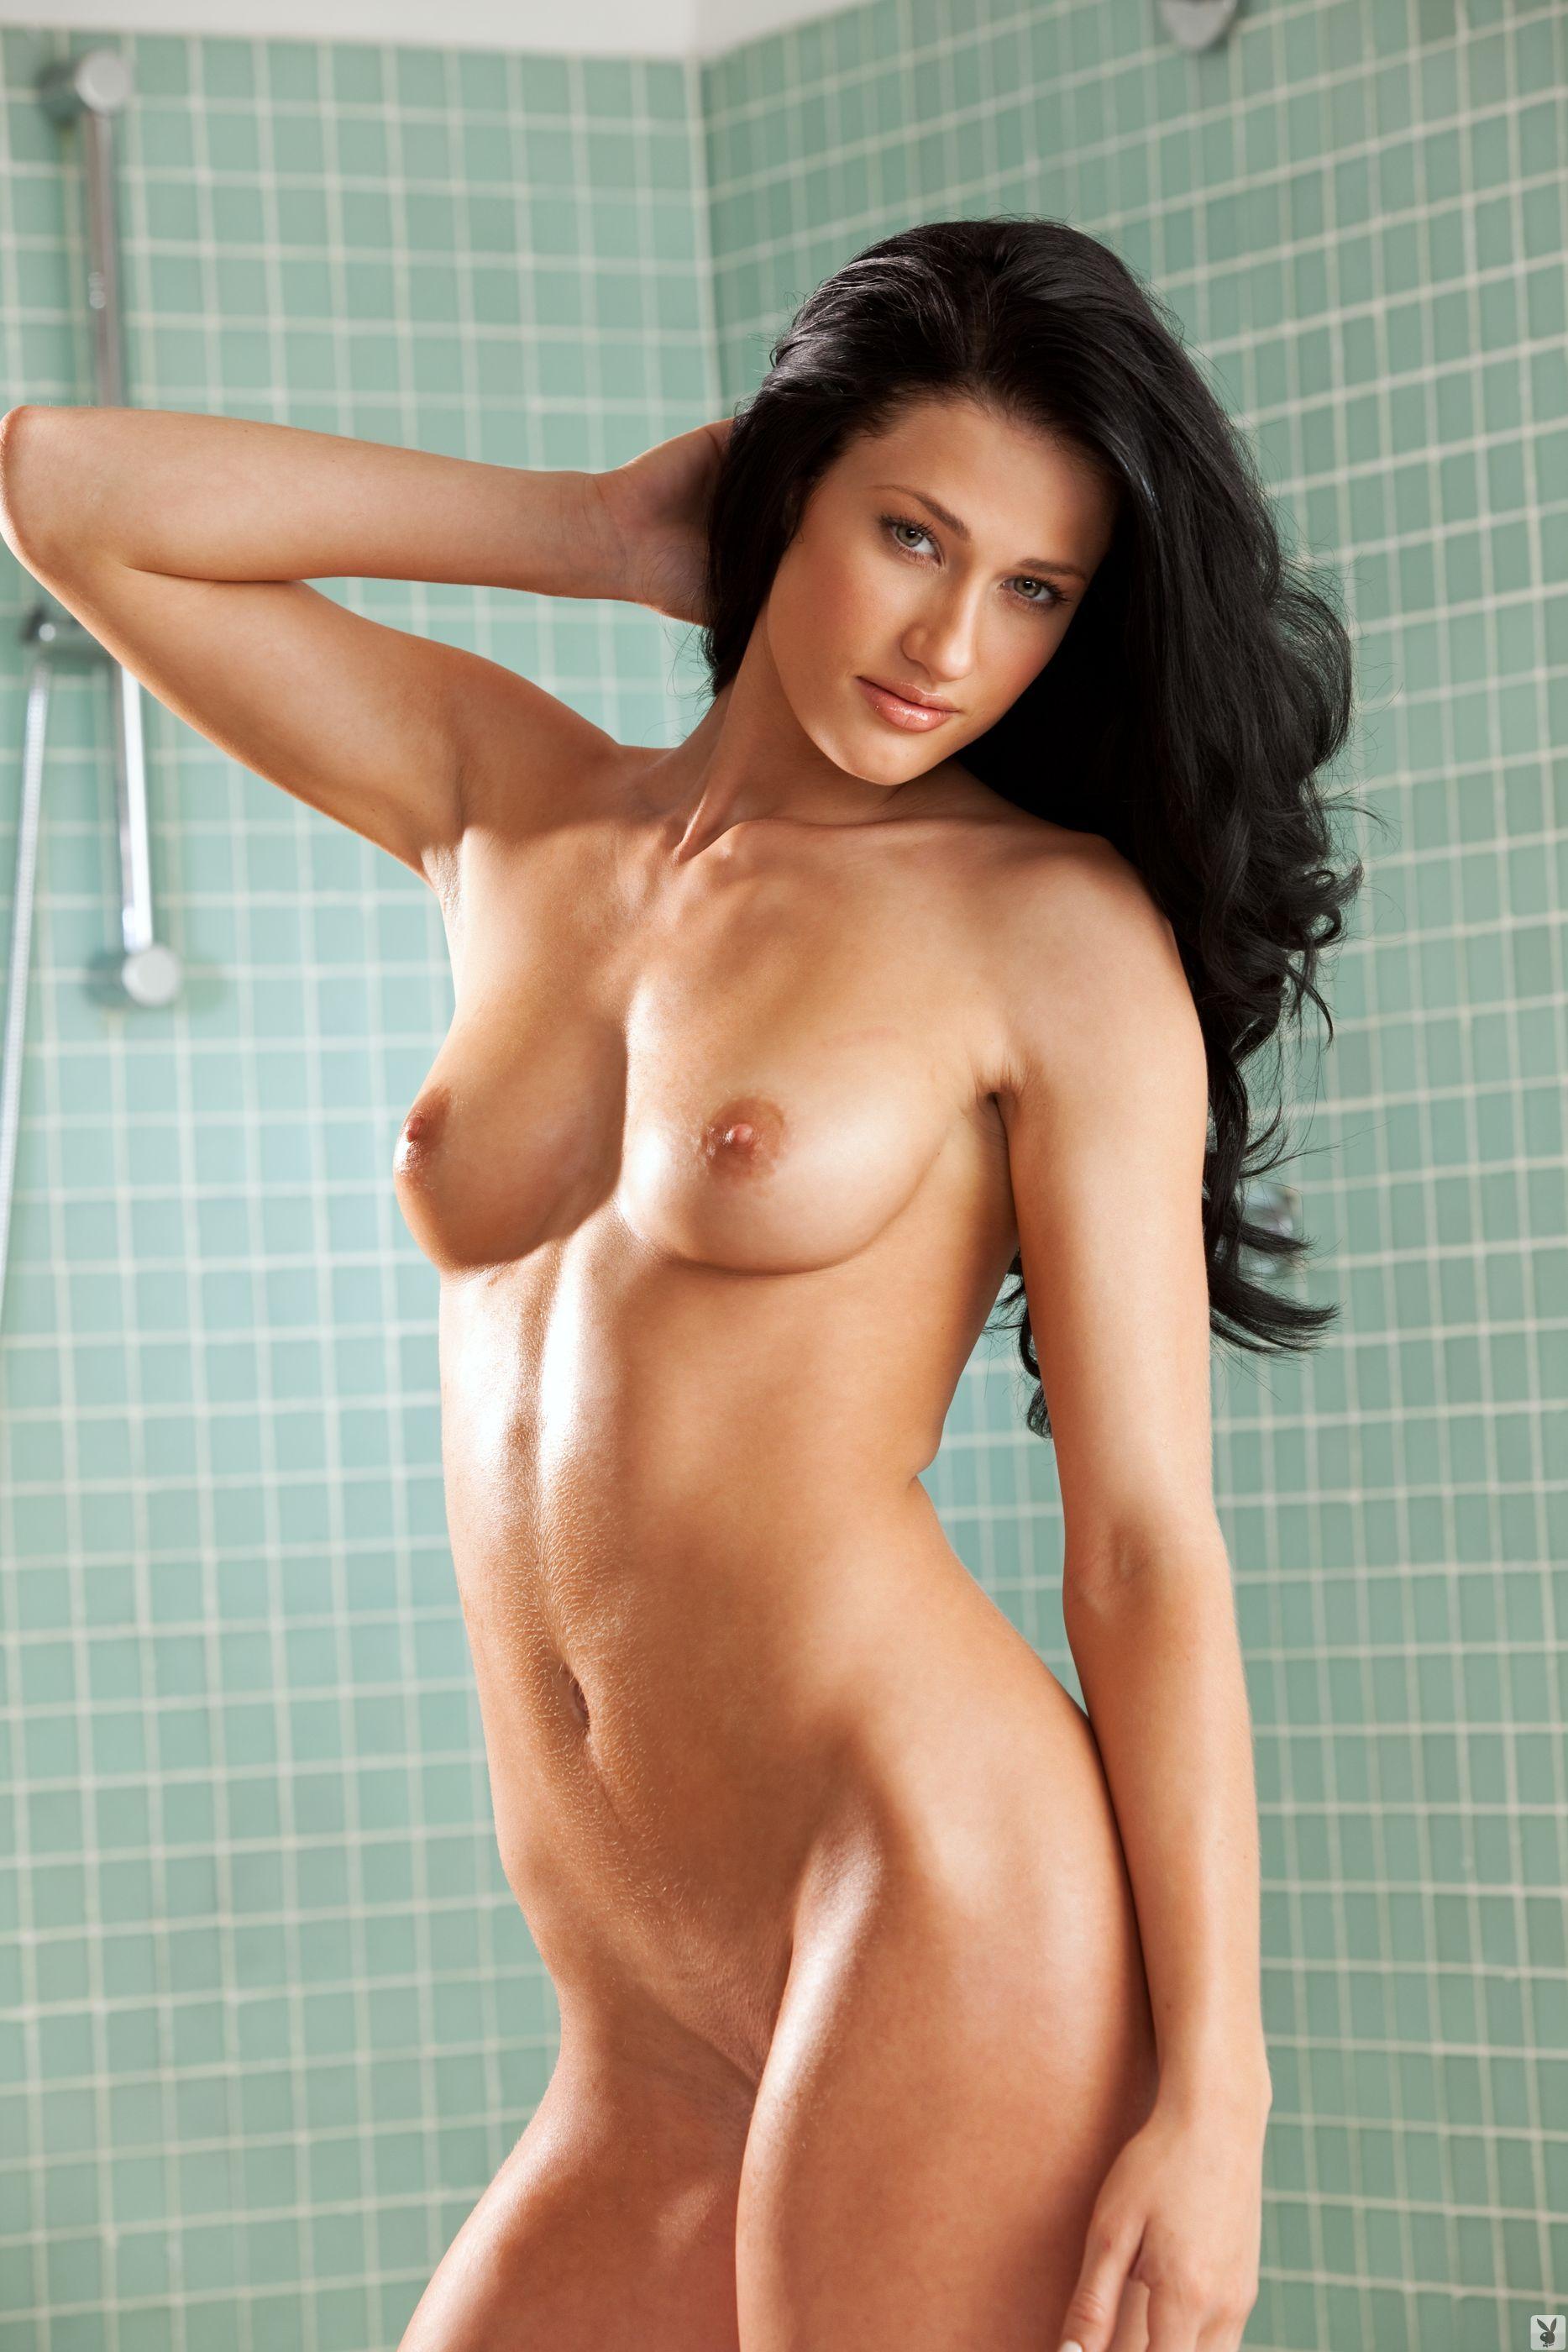 ashton-winters-brunette-nude-bathroom-playboy-06